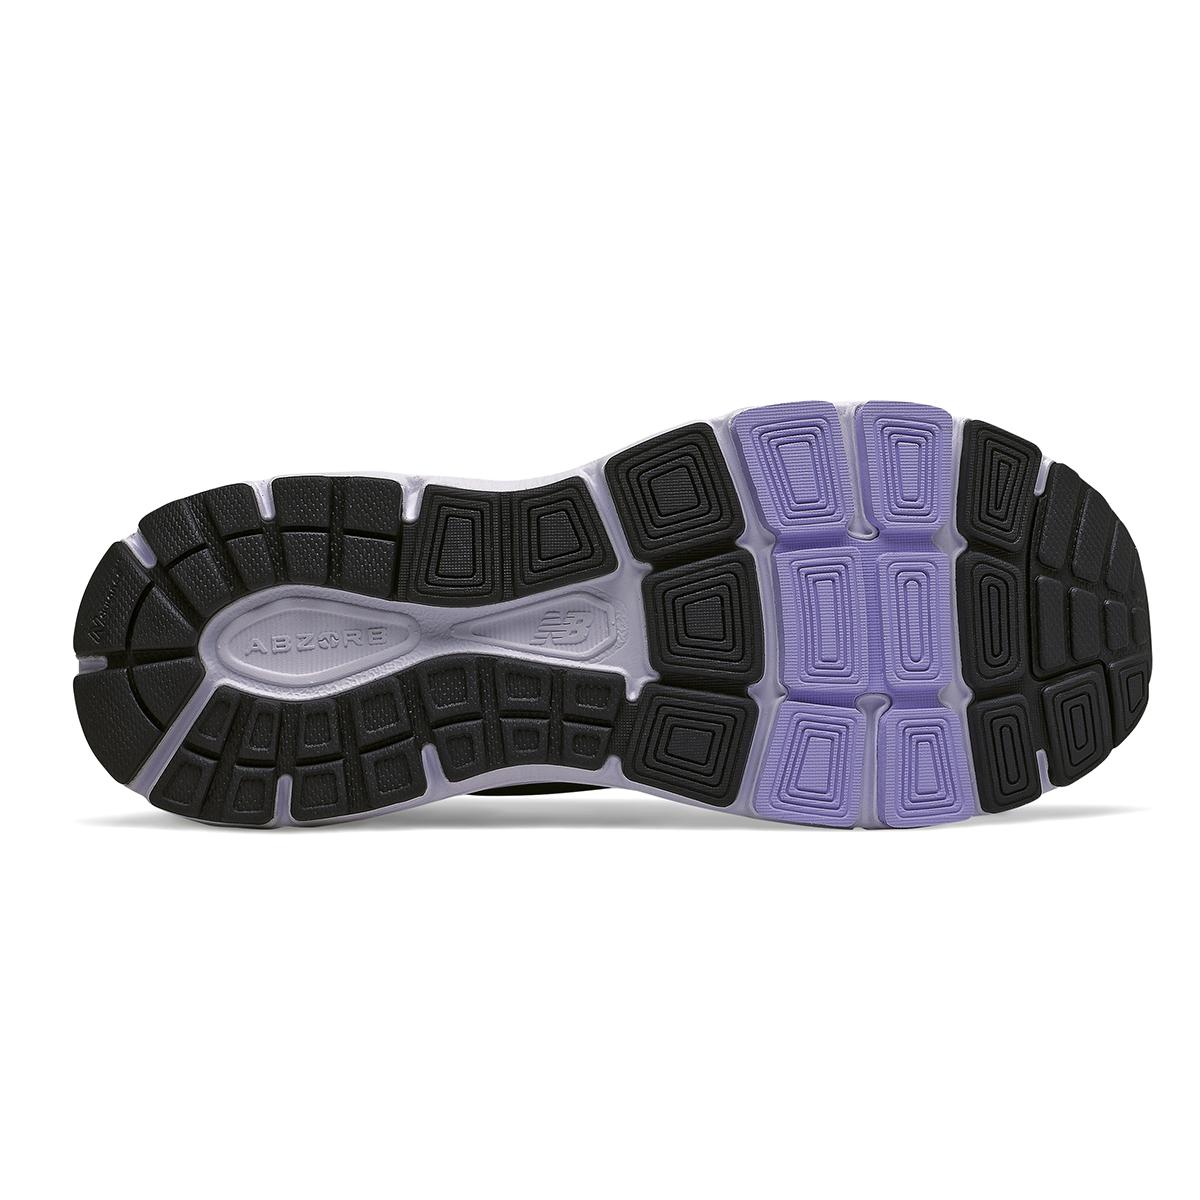 Women's New Balance 840V4 Walking Shoe - Color: Black - Size: 5 - Width: Narrow, Black, large, image 4